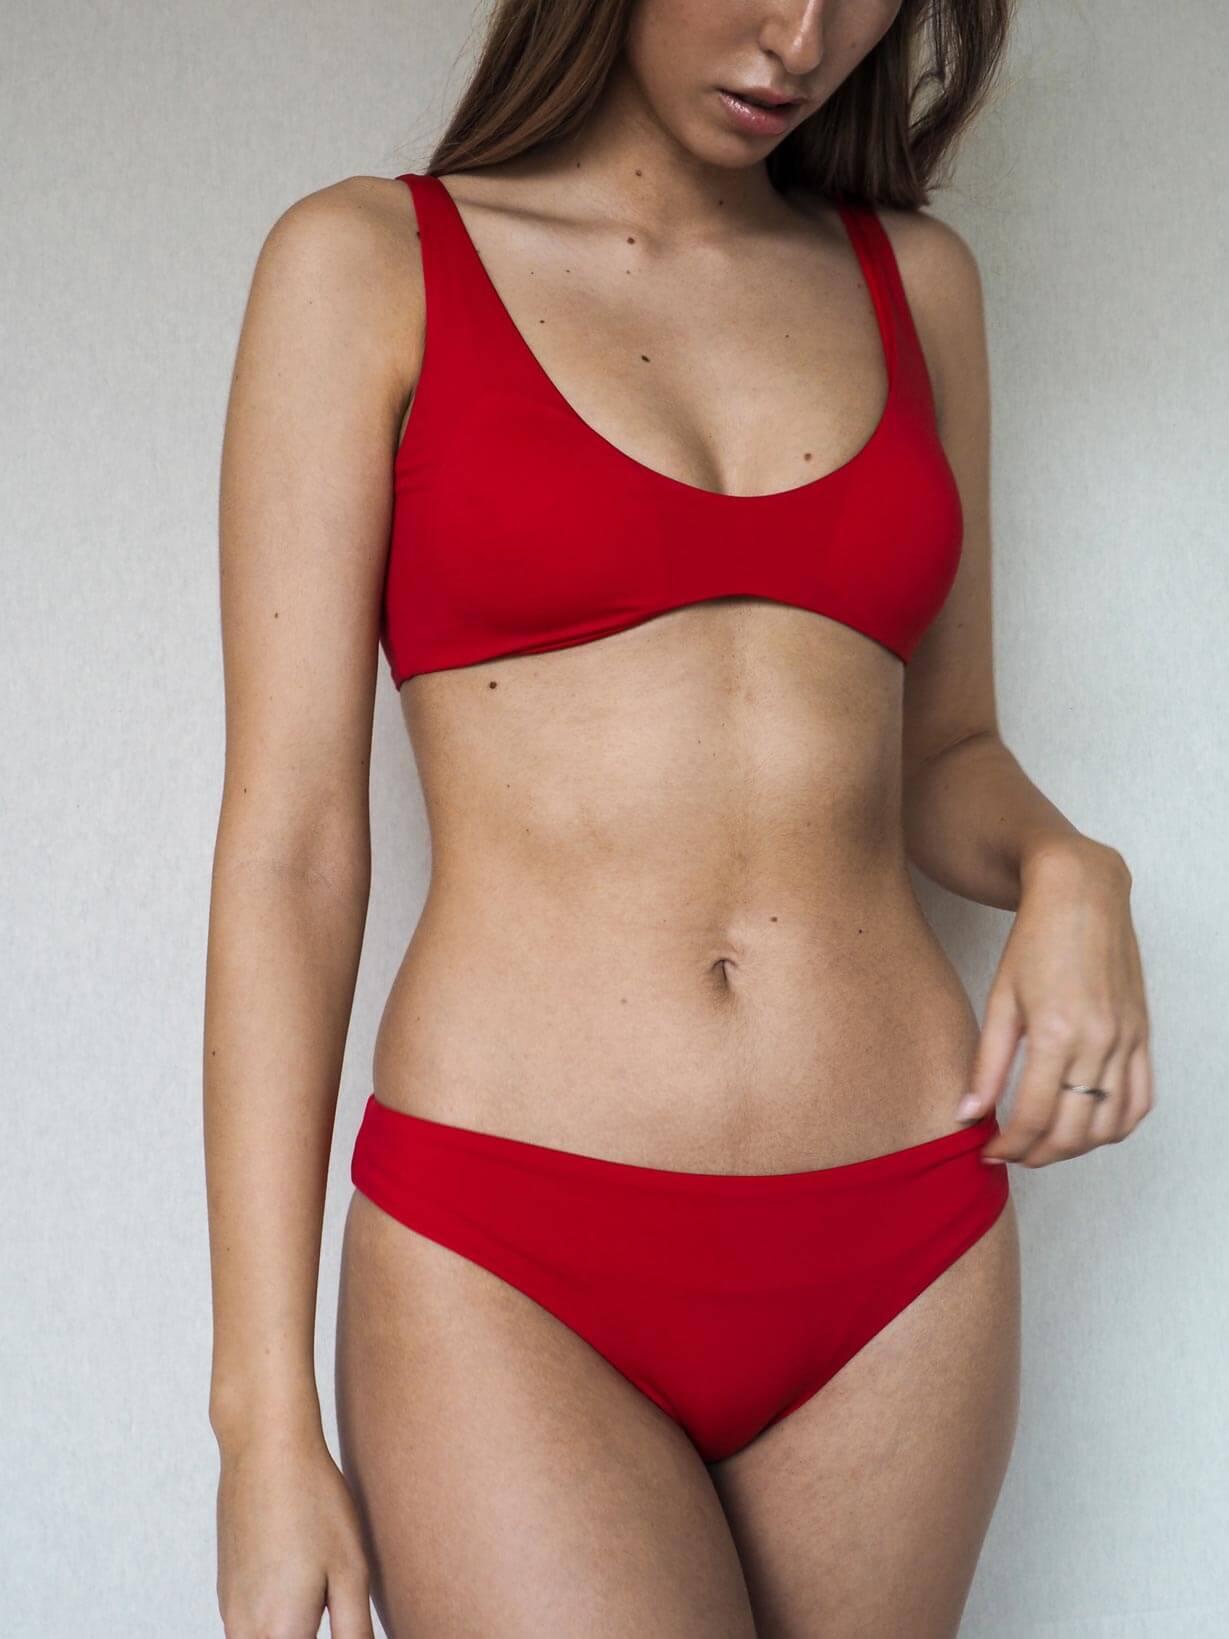 una chica lleva un bikini rojo de la marca Essive